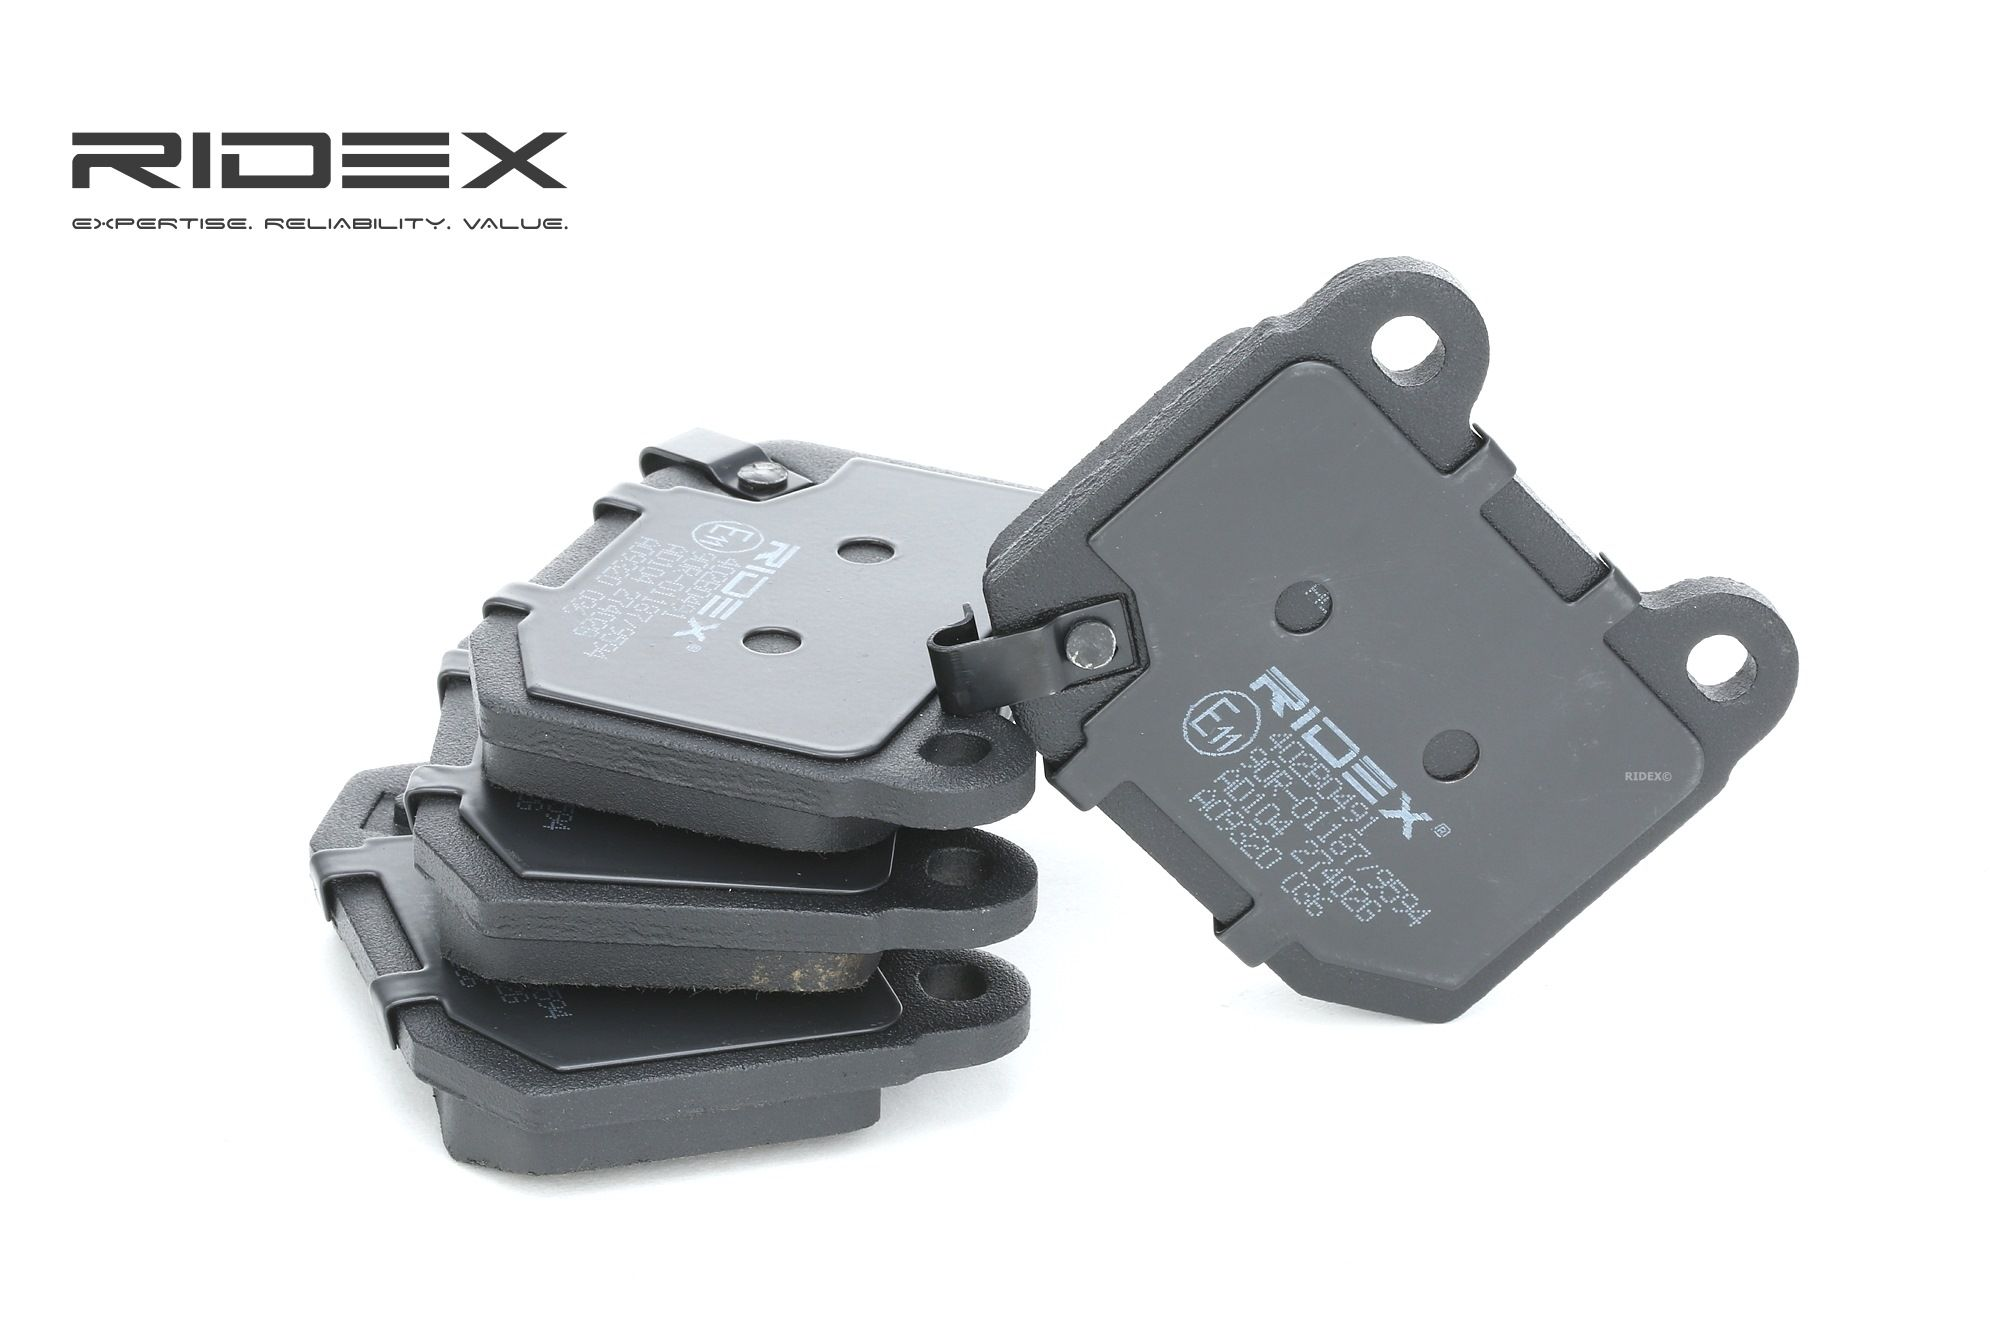 SUBARU WRX 2021 Bremsklötze - Original RIDEX 402B0491 Höhe: 65,5mm, Breite: 76,5mm, Dicke/Stärke: 14,3mm